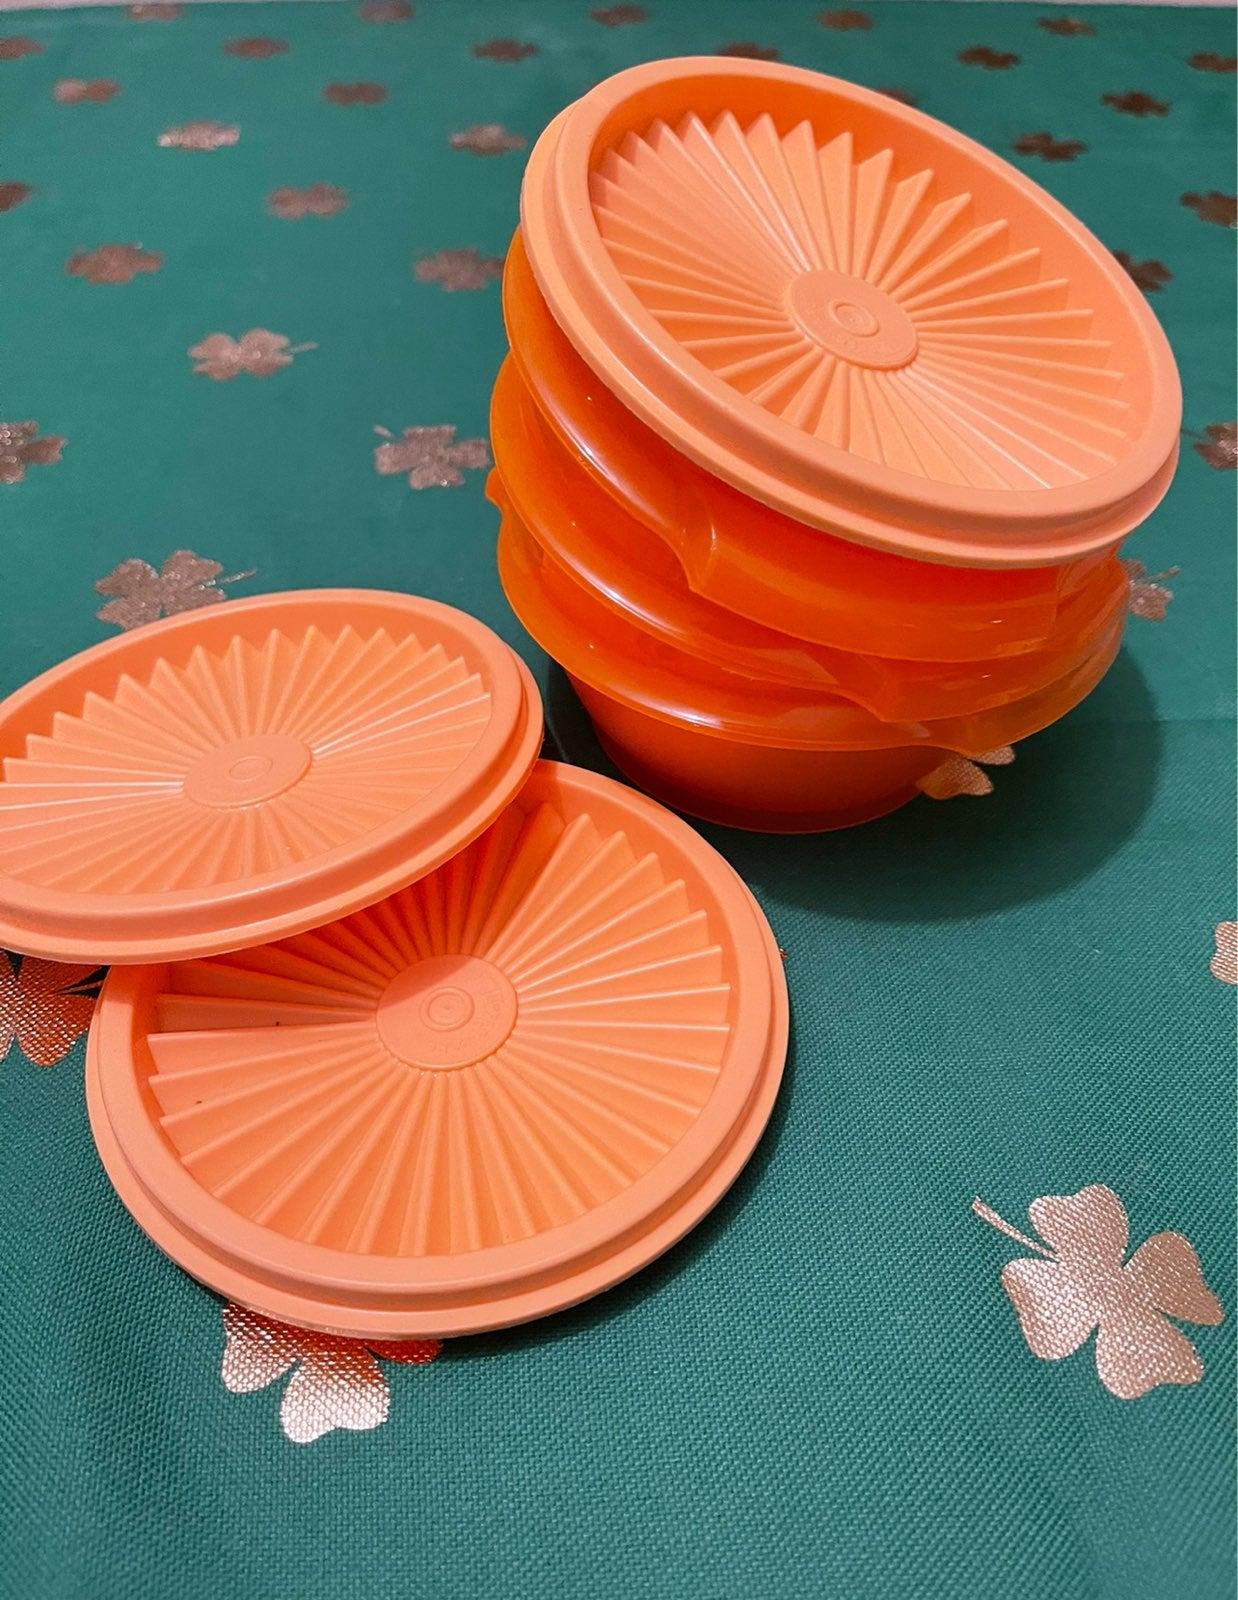 Tupperware Servalier Set of 3